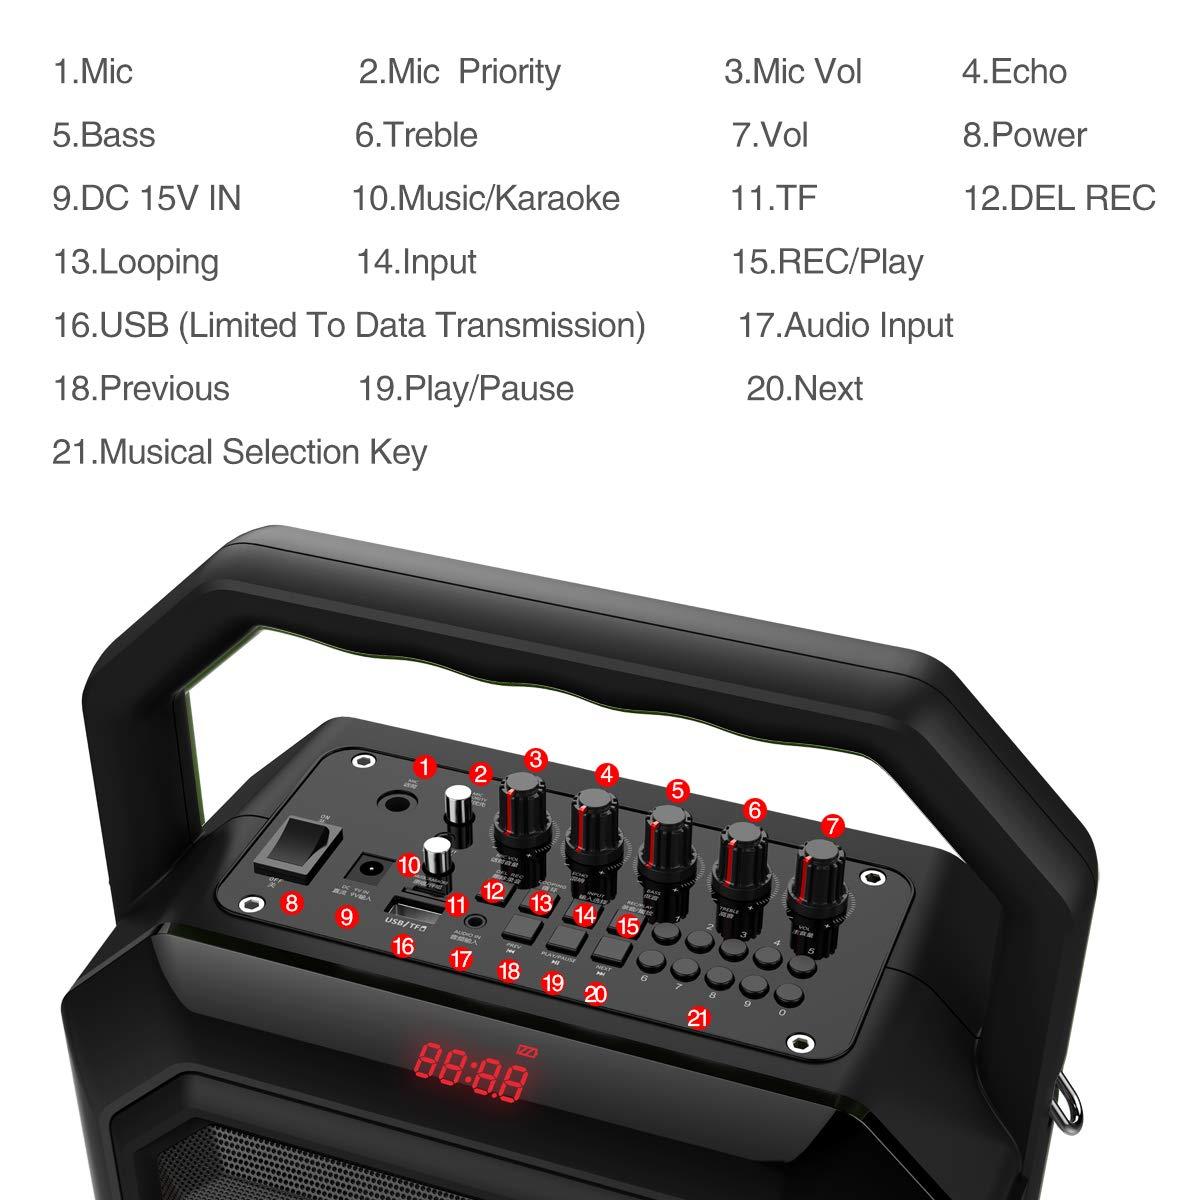 Presenter Wireless Voice Amplifier with Headset Mic 18W Voice Loudspeaker Portable Bluetooth Speaker Waterproof IPX5 Power Bank for Outdoor Activities Teachers Salesman etc Shower